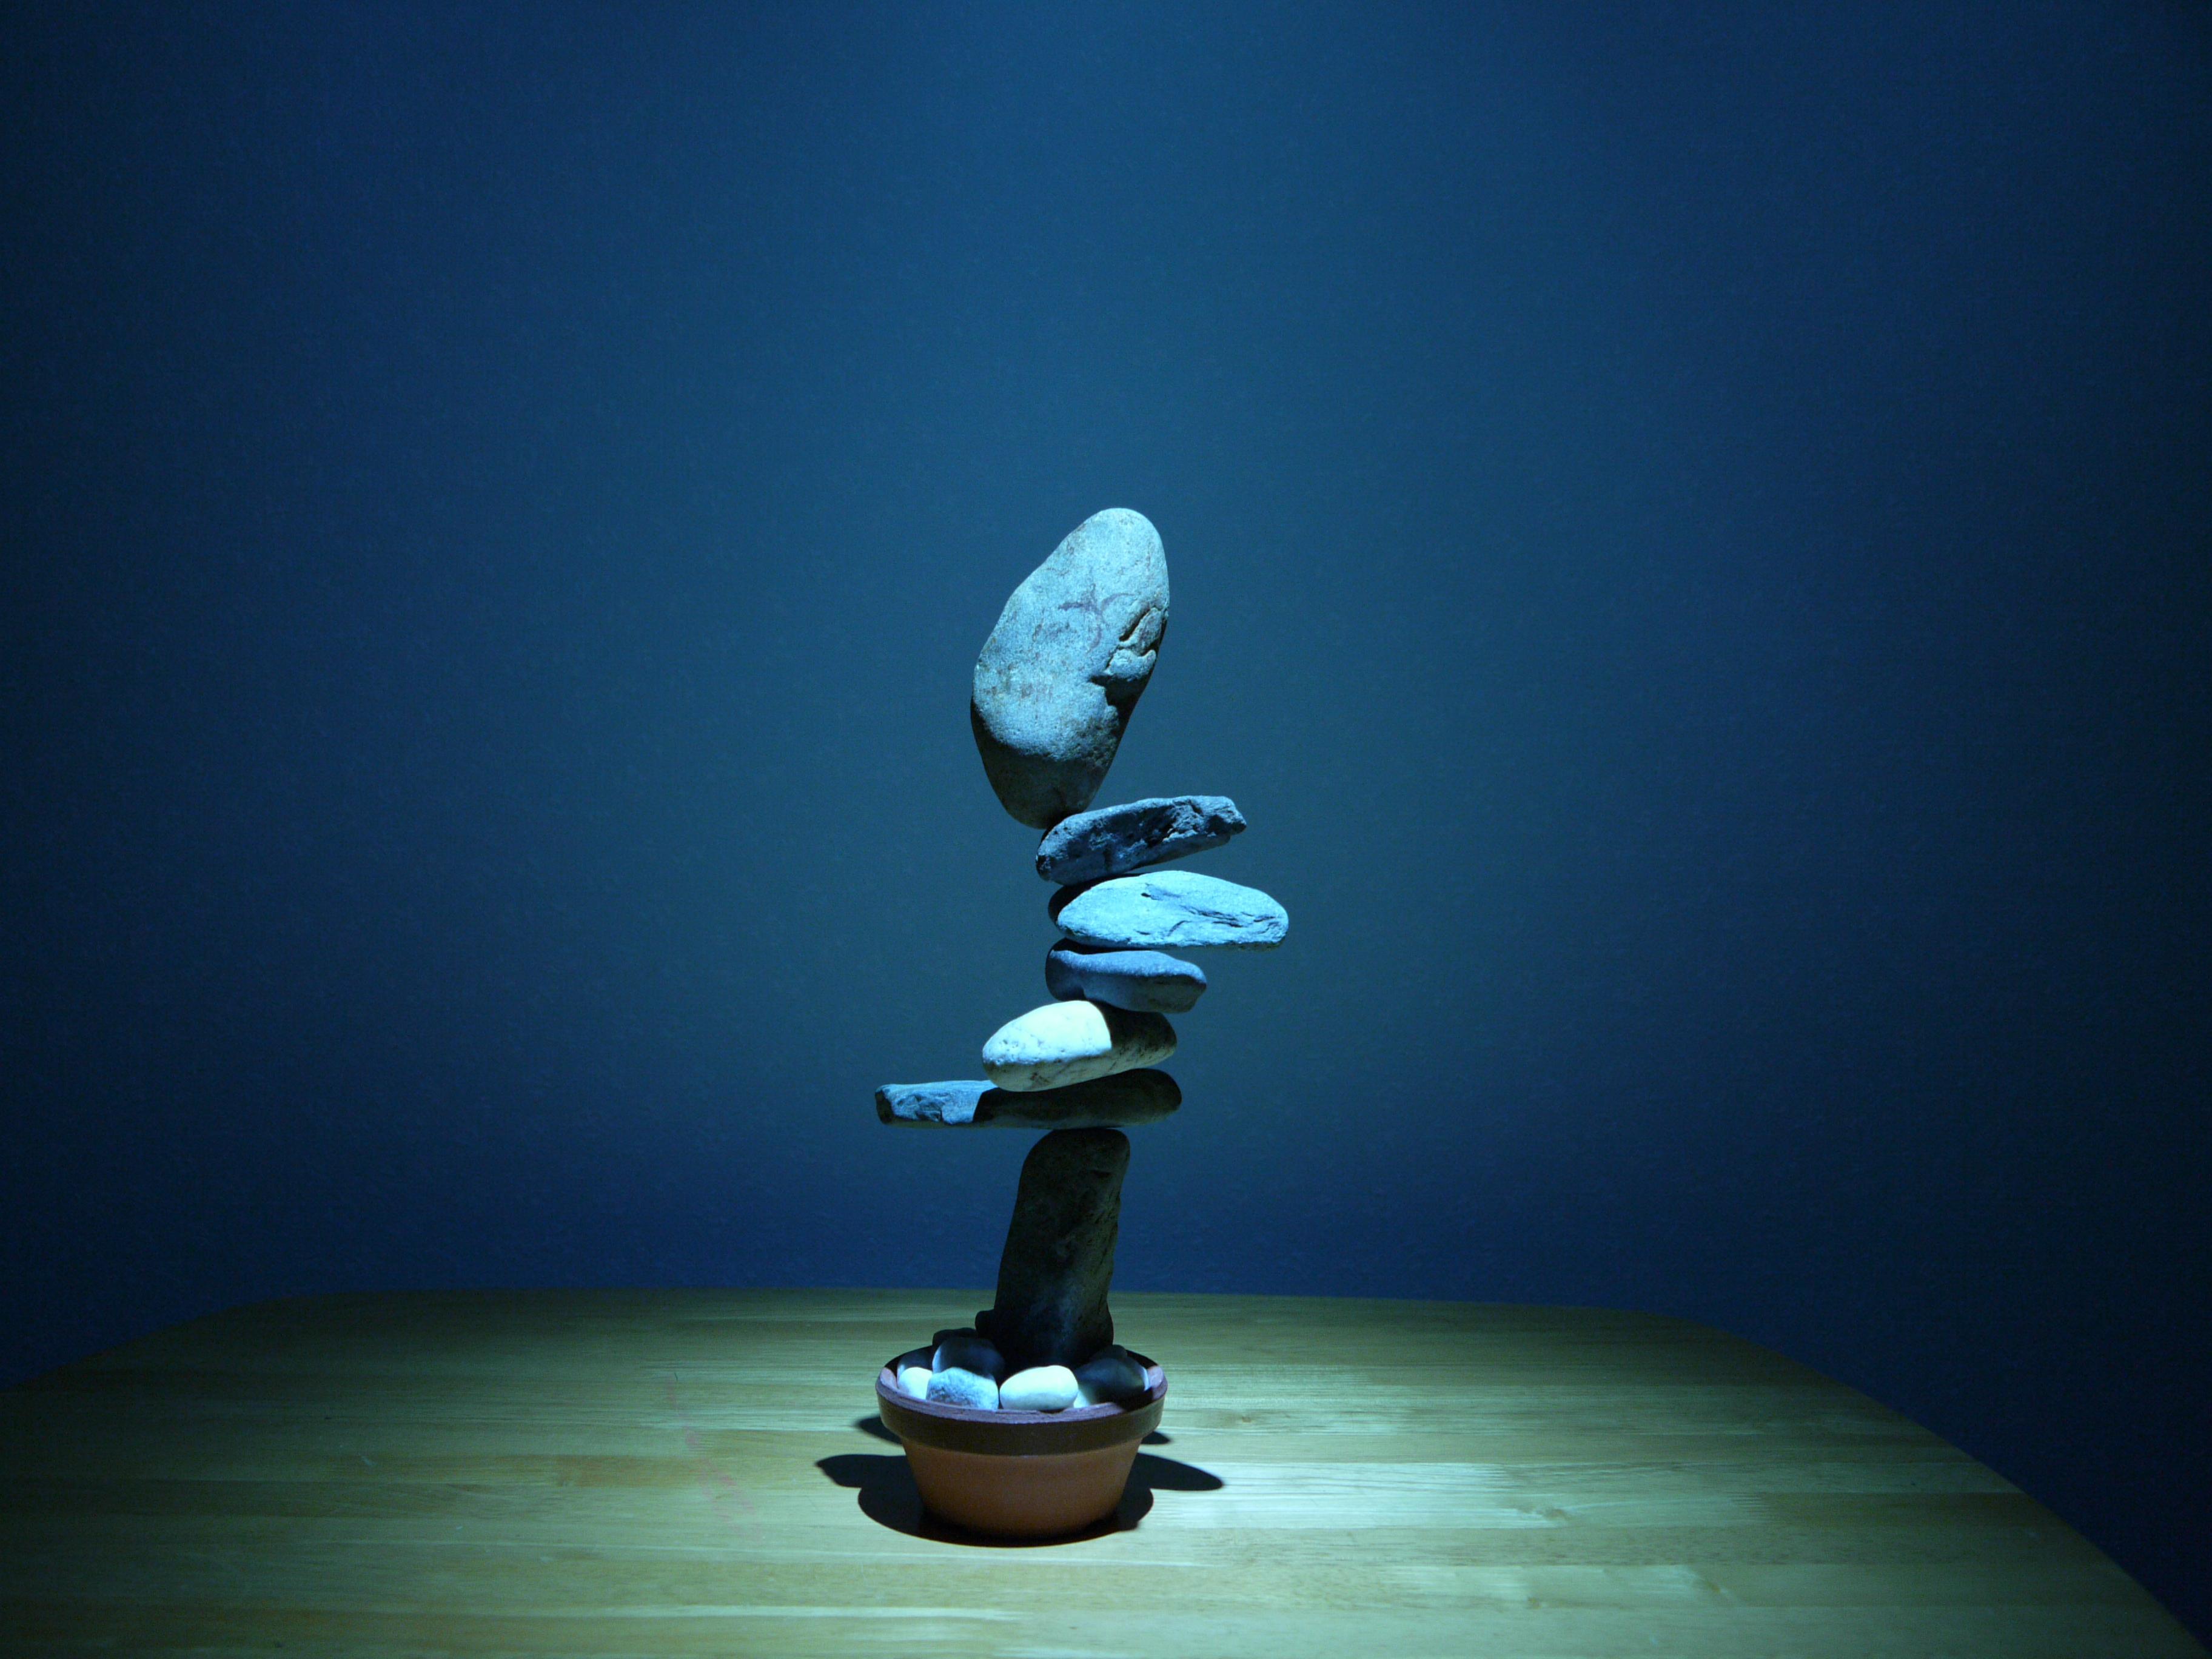 http://chitoku.balancing.jp/wp-content/uploads/P1210524.jpg